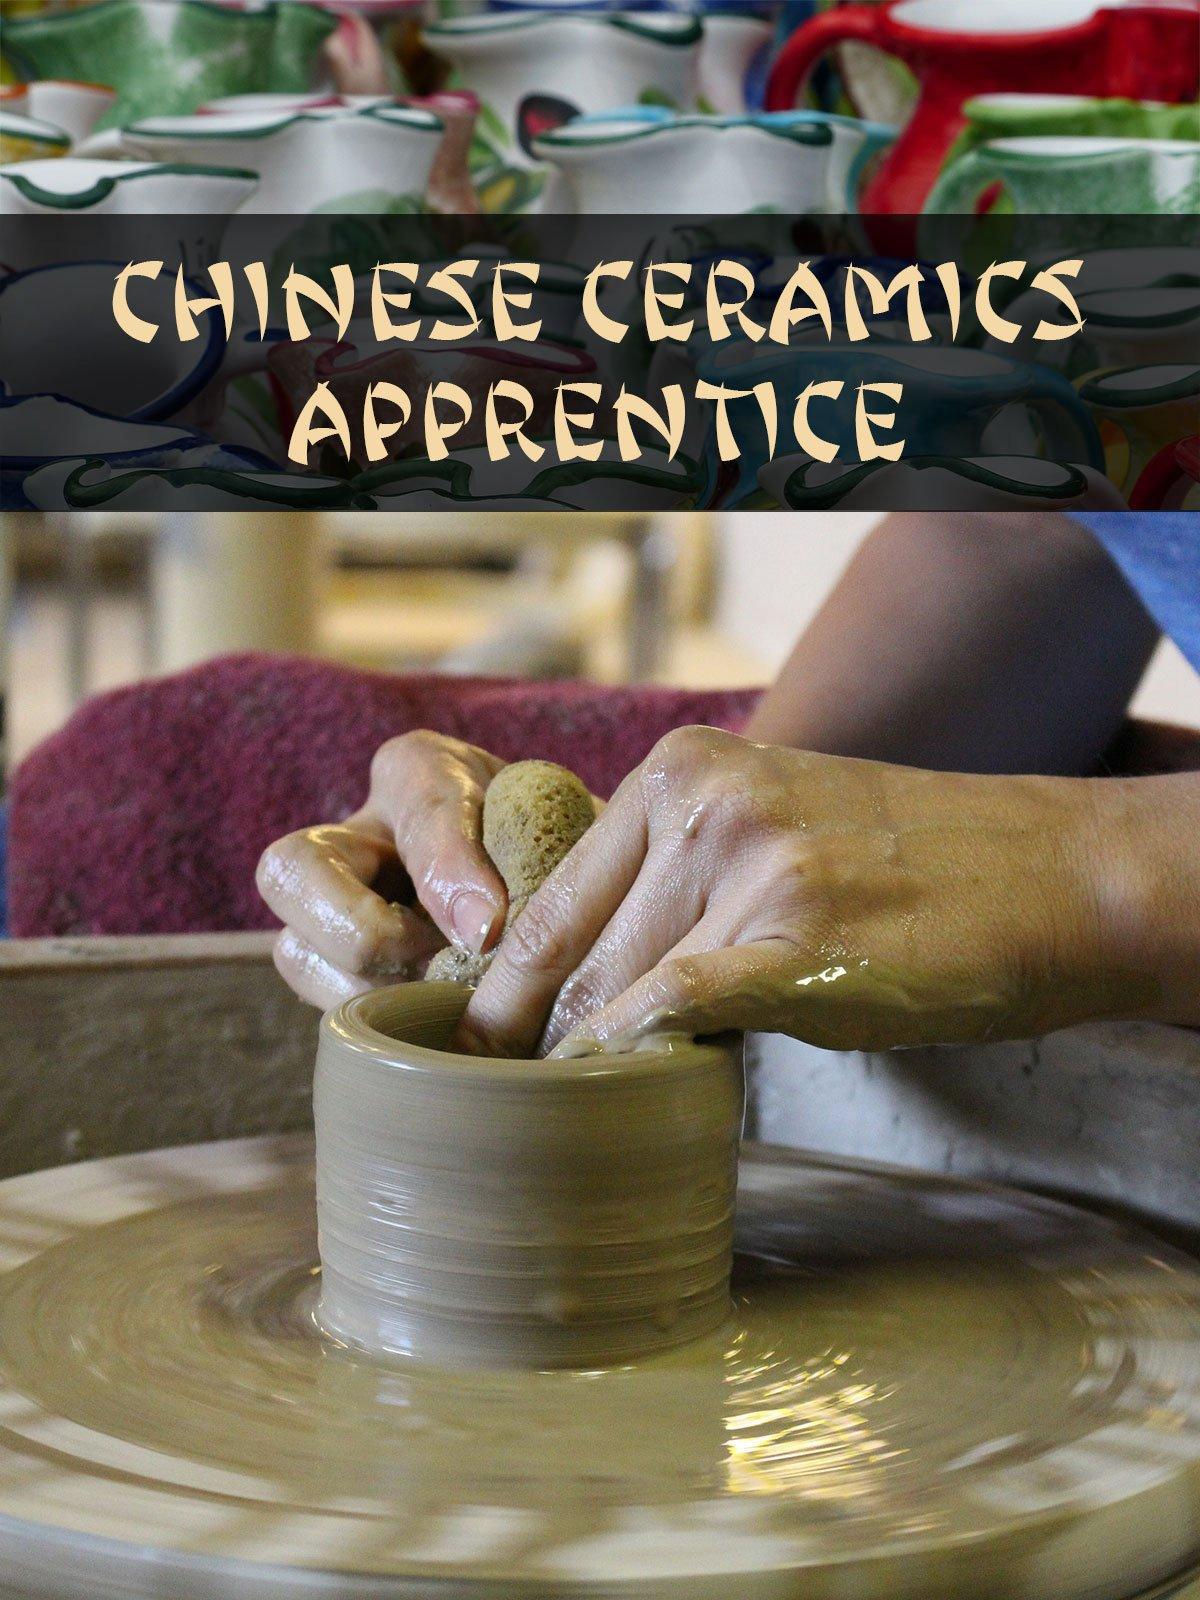 Chinese Ceramics Apprentice on Amazon Prime Video UK